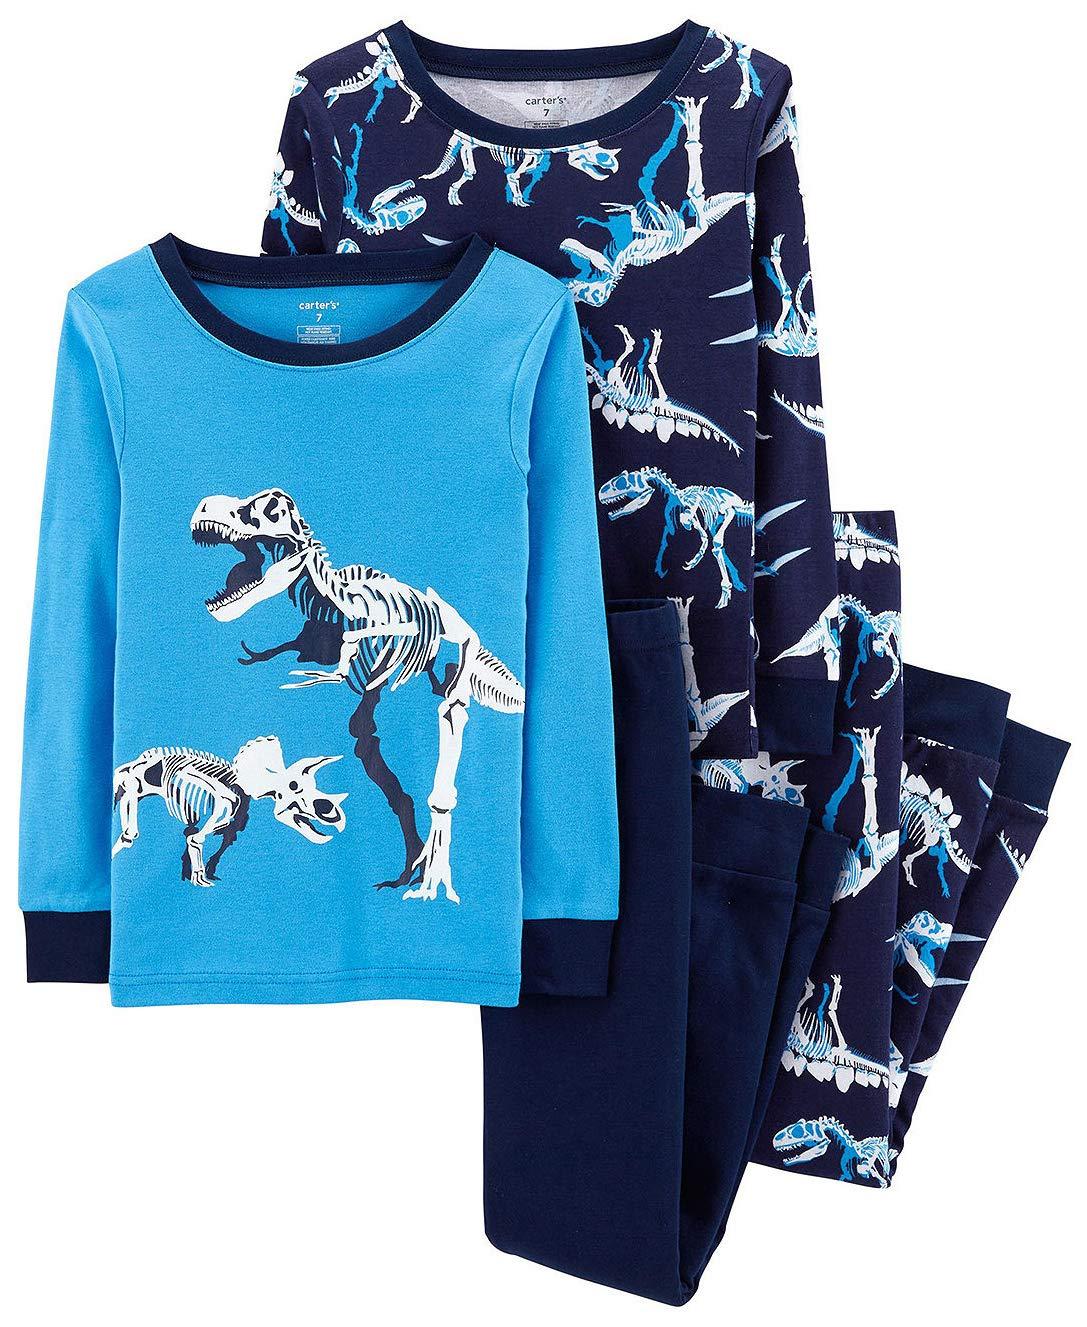 Carter's Little Boys' Snug Fit Cotton Pajamas (Navy/Dinos, 6) by Carter's